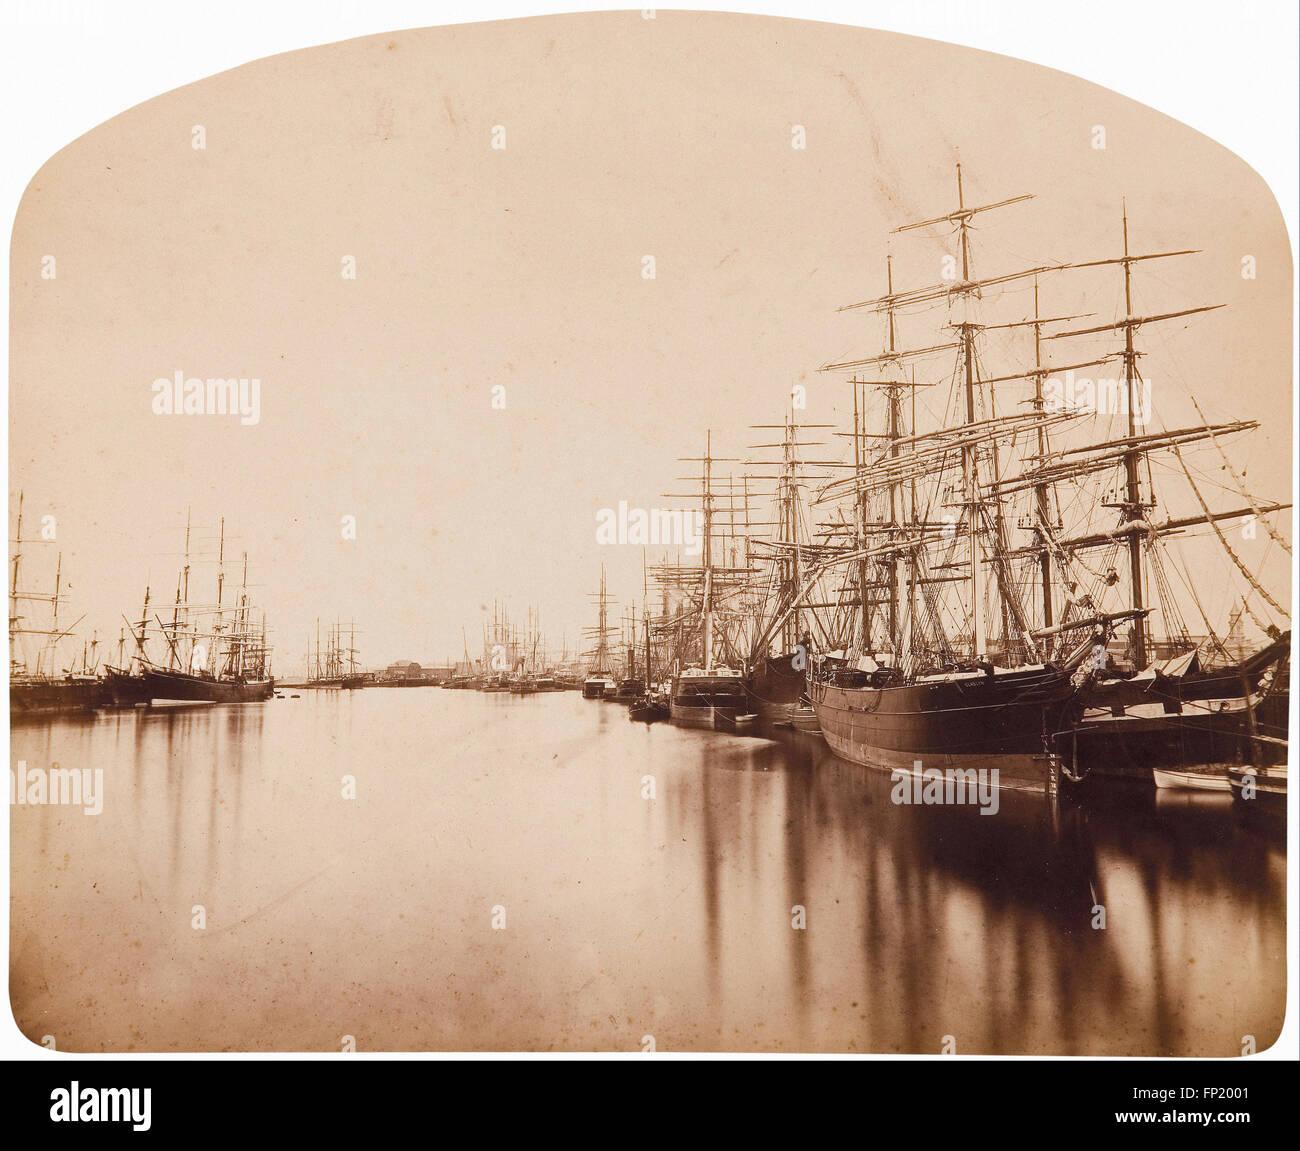 George Freeman - Port Adelaide, downstream - Stock Image